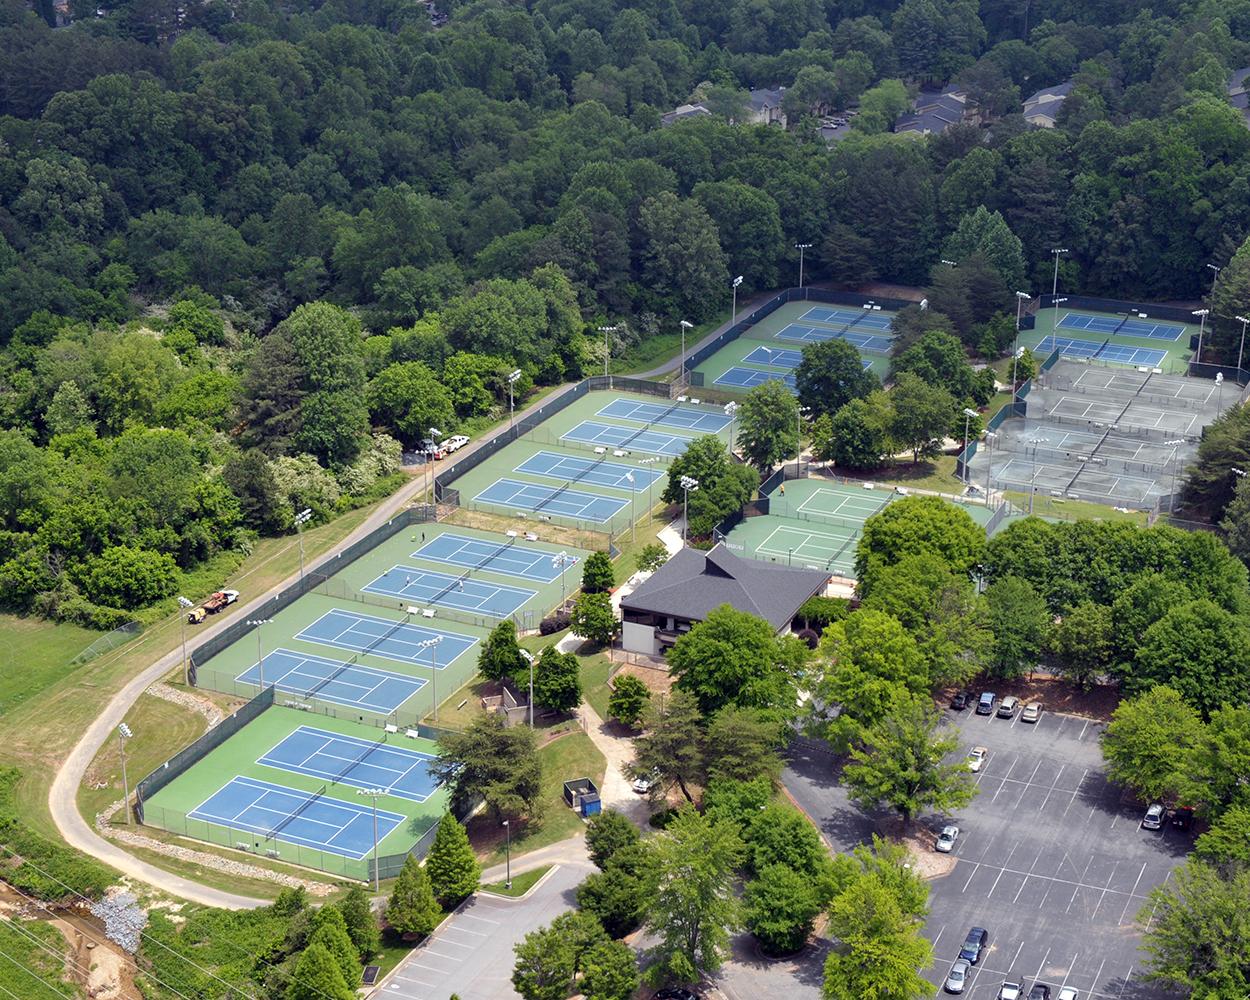 North Fulton Tennis Center